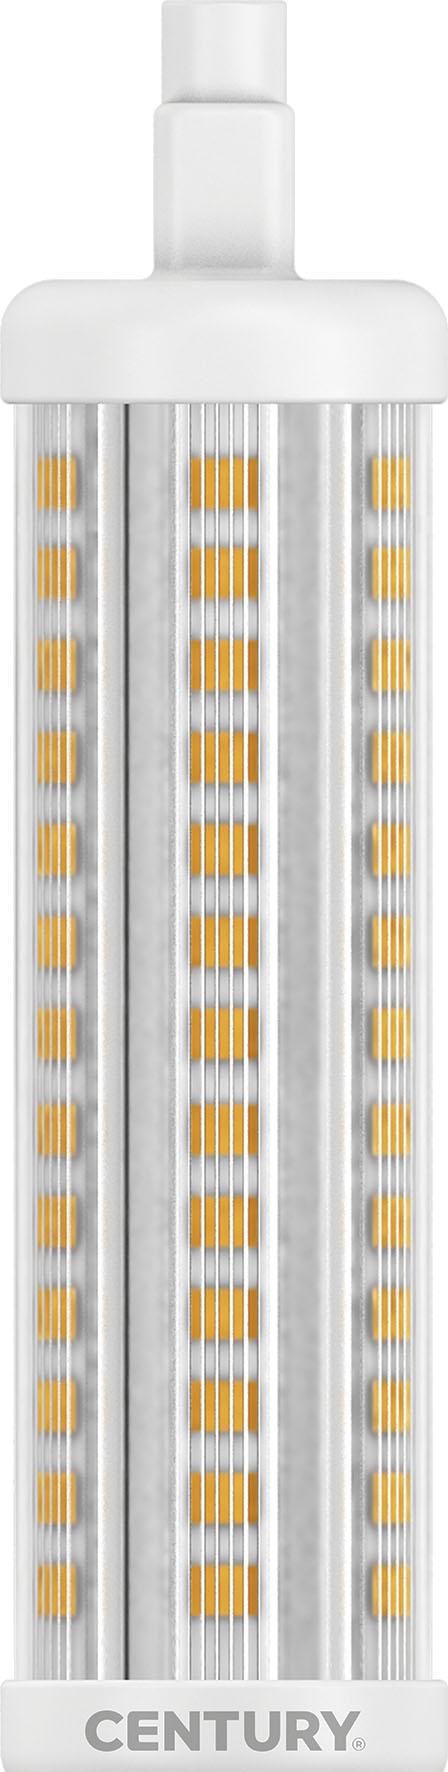 LAMP LED LINEAR 15W MM 118 NA